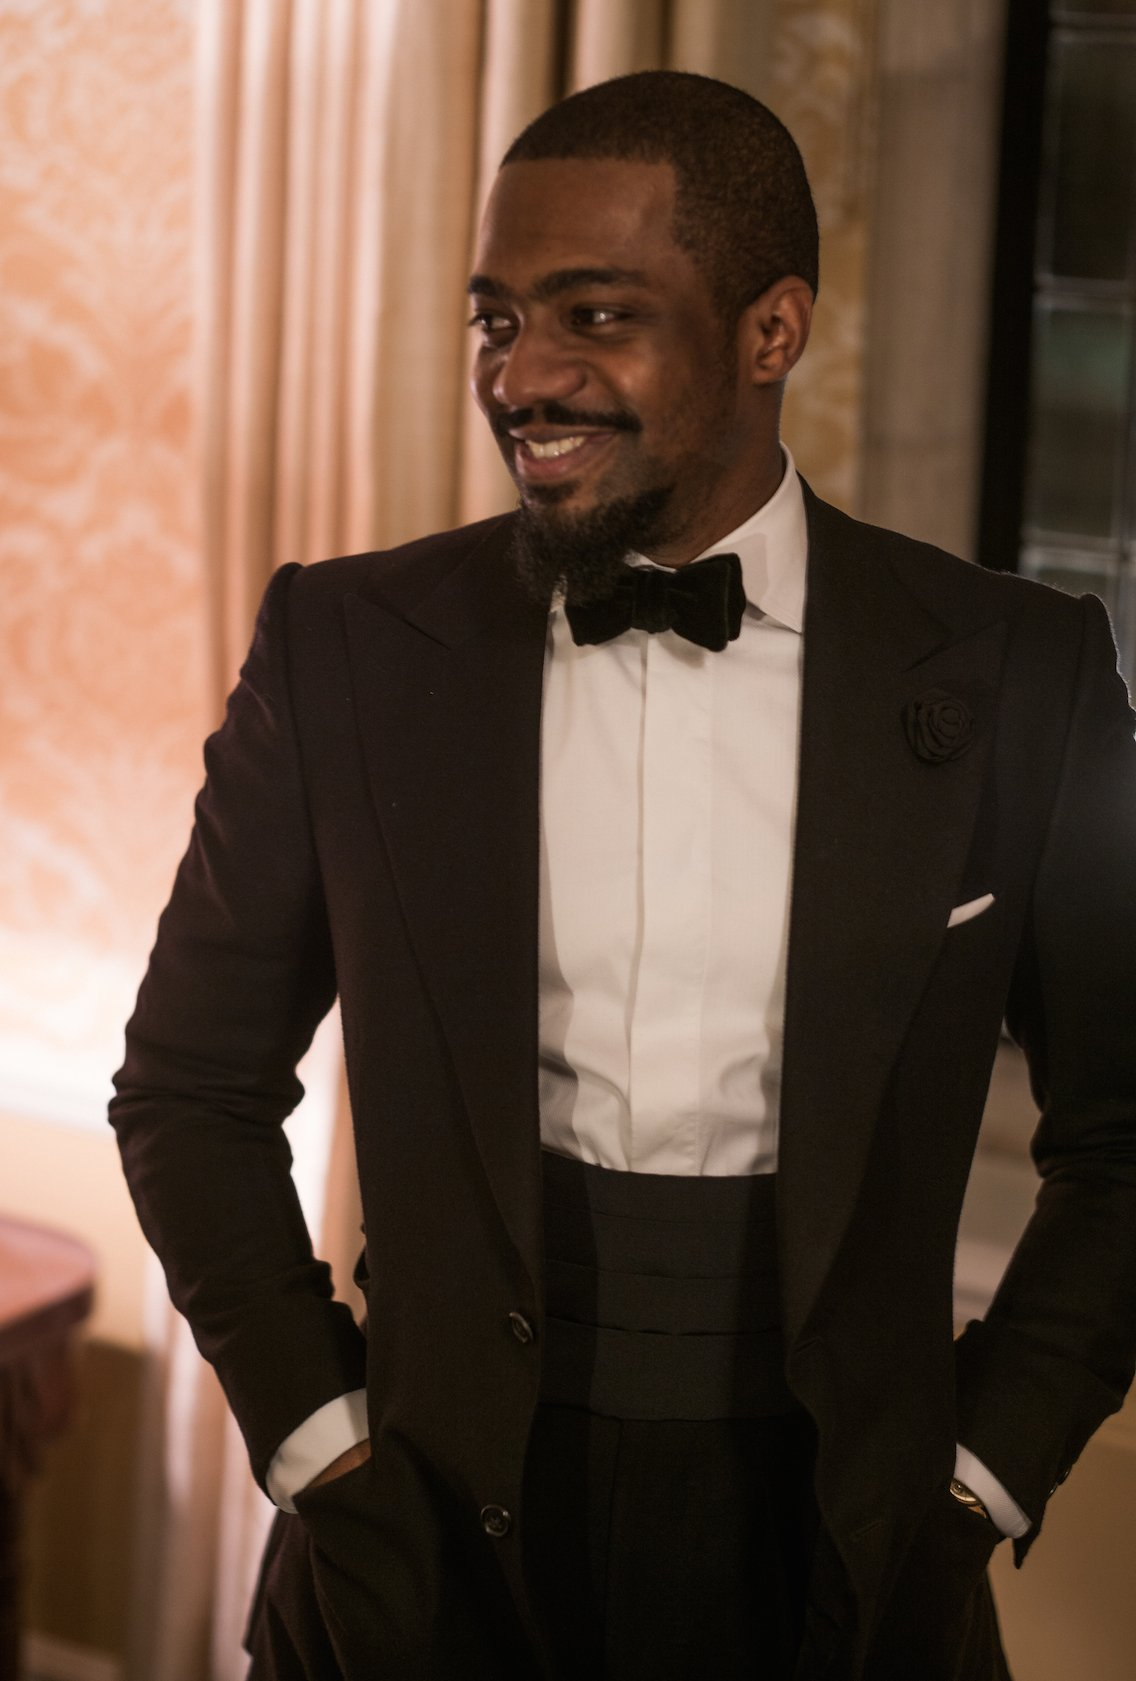 Btba Dinner The Best Dressed Men In Black Tie Permanent Style